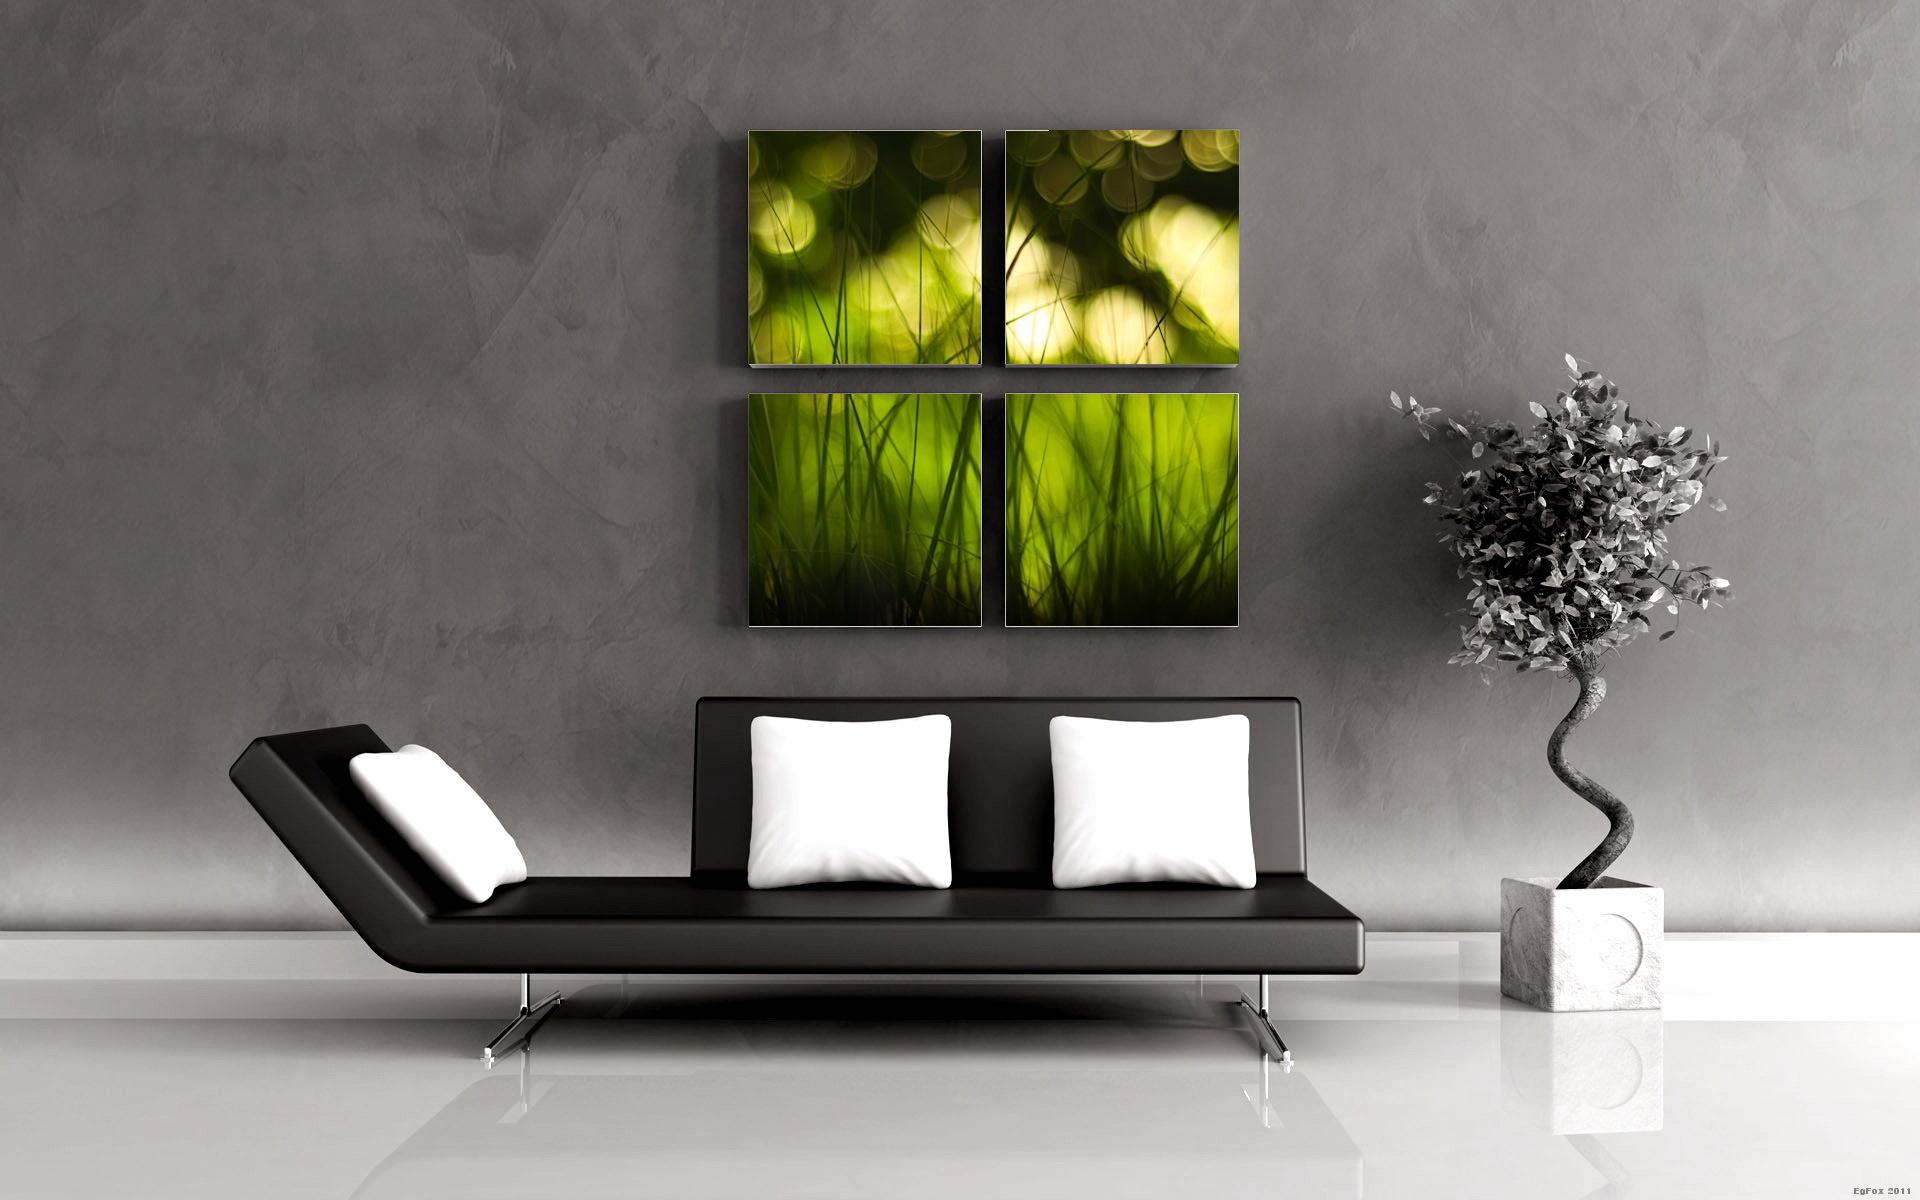 Wallpaper 1920x1200 Px 3d Art Artistic Cg Design